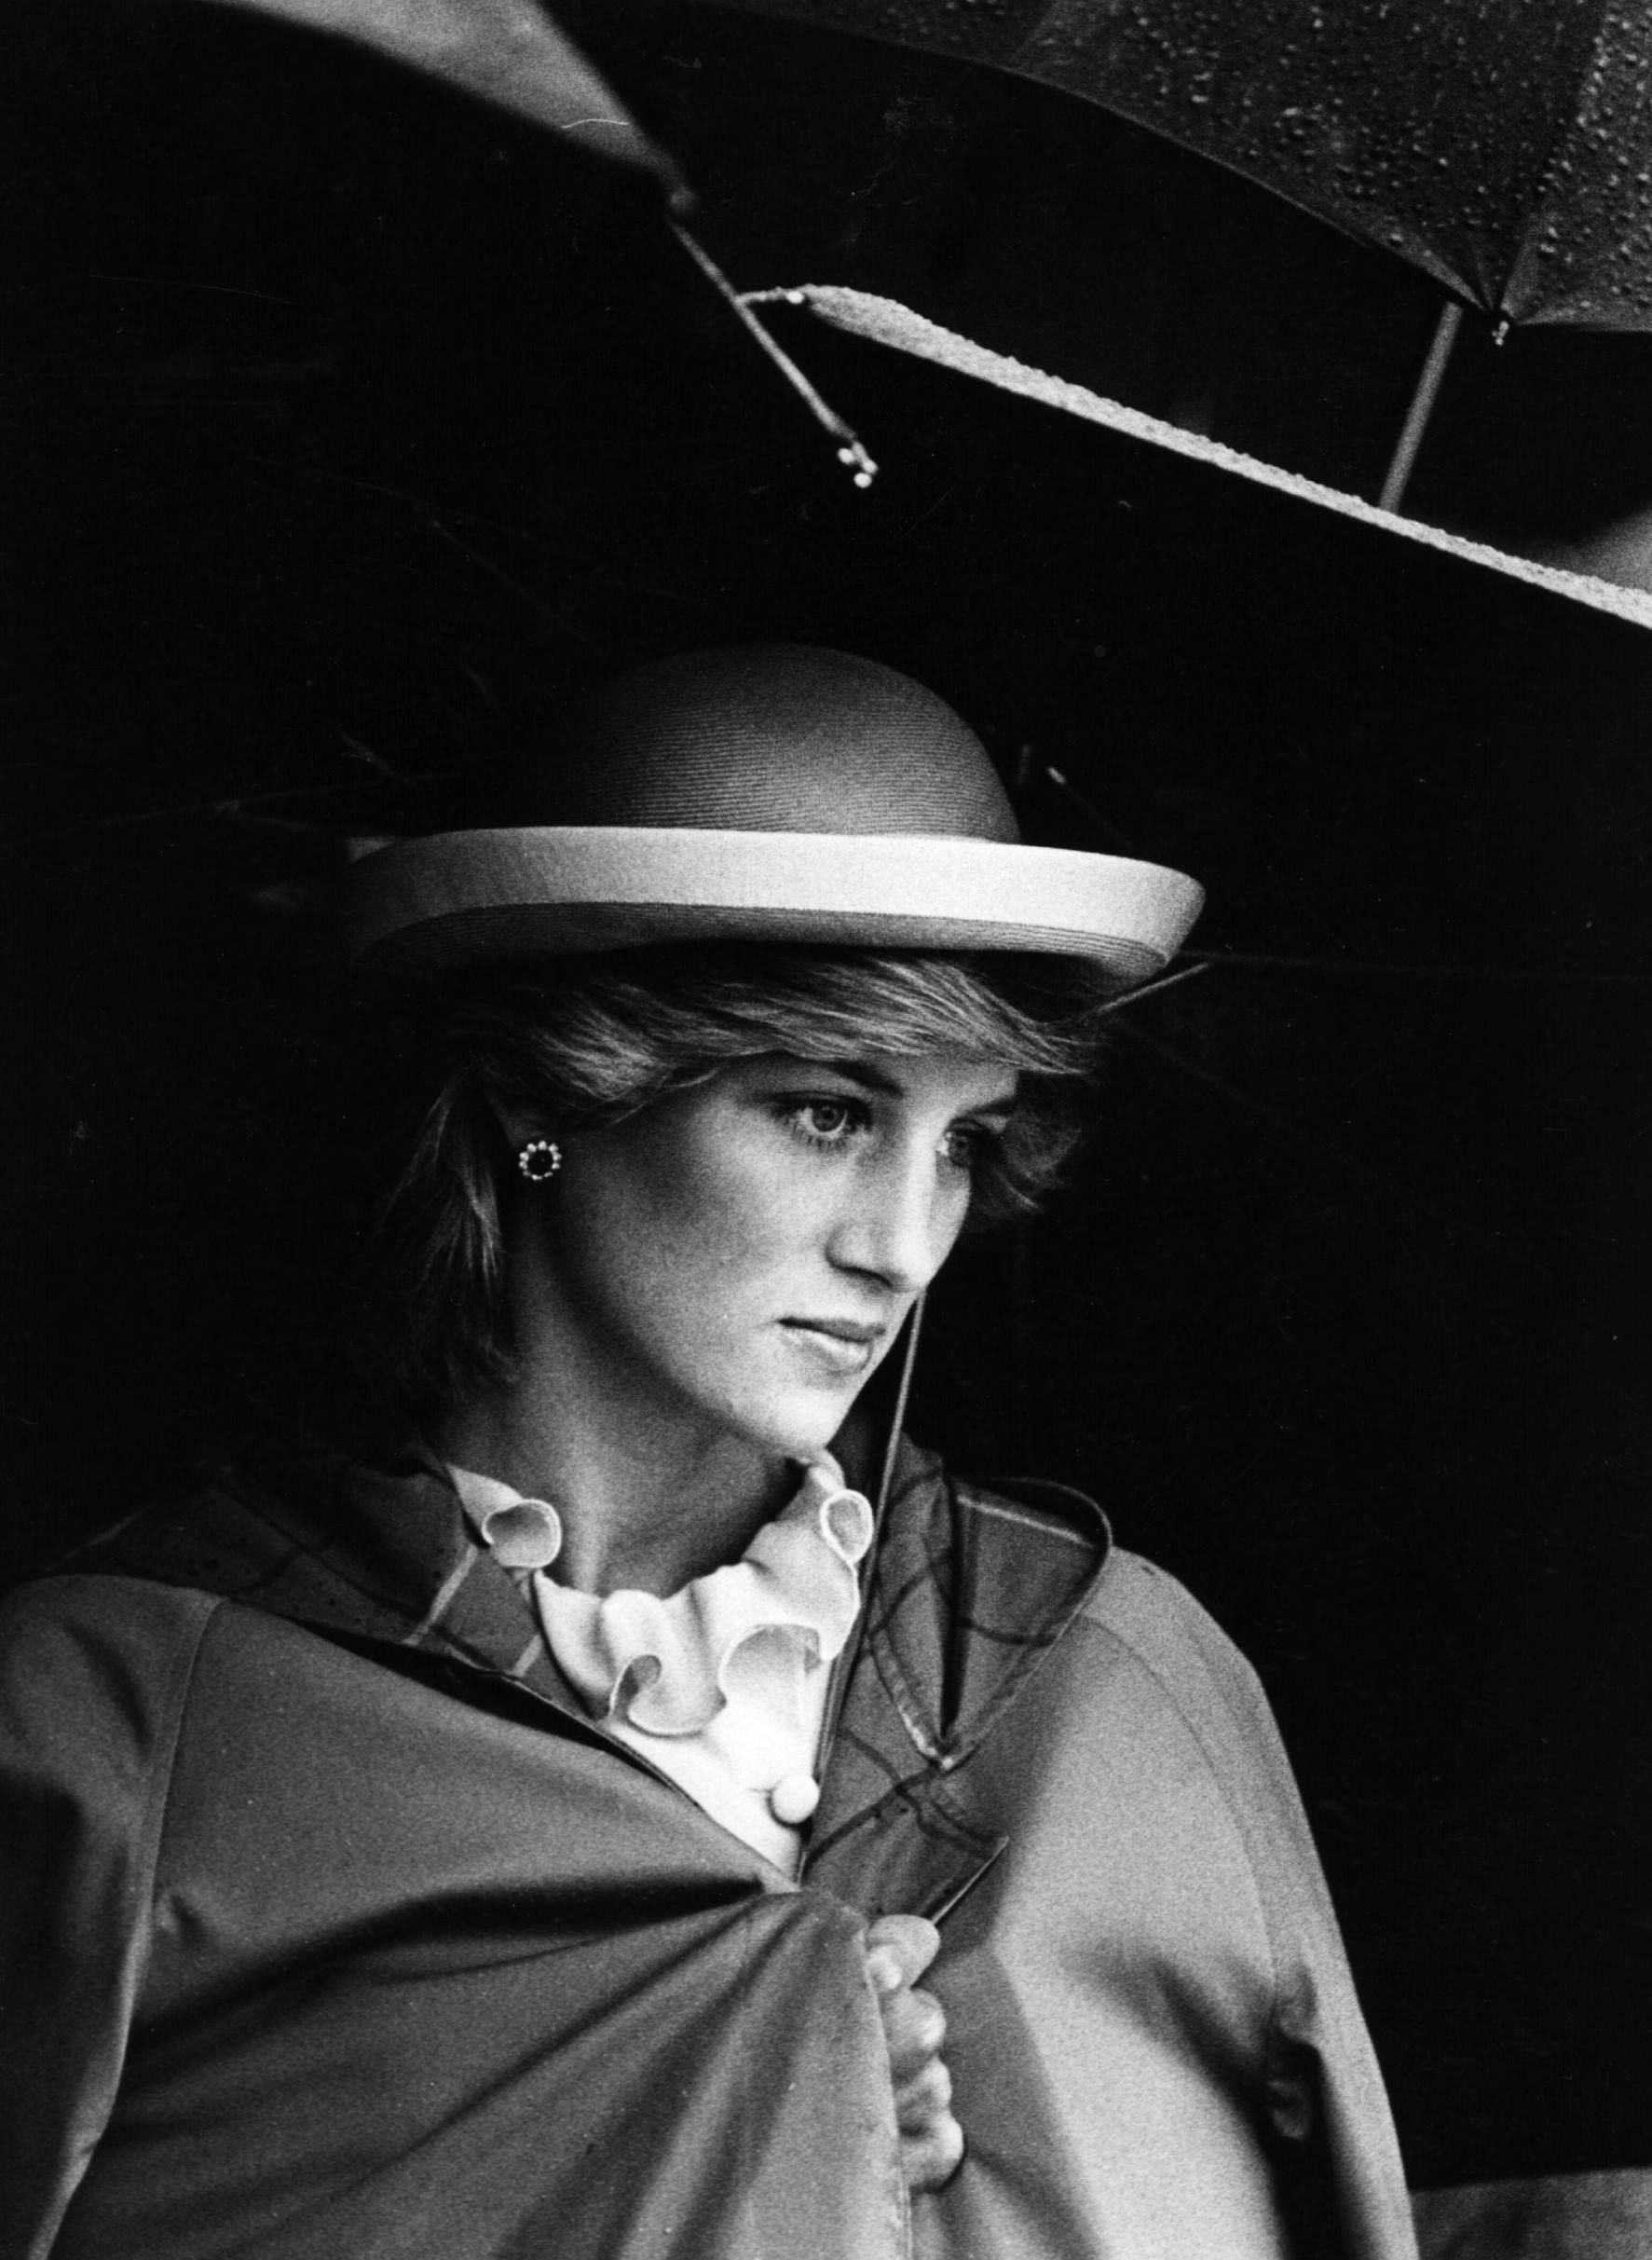 17 Gorgeous Photos of Princess Diana You've Never Seen Before | Princess diana, Princes diana, Princess diana rare